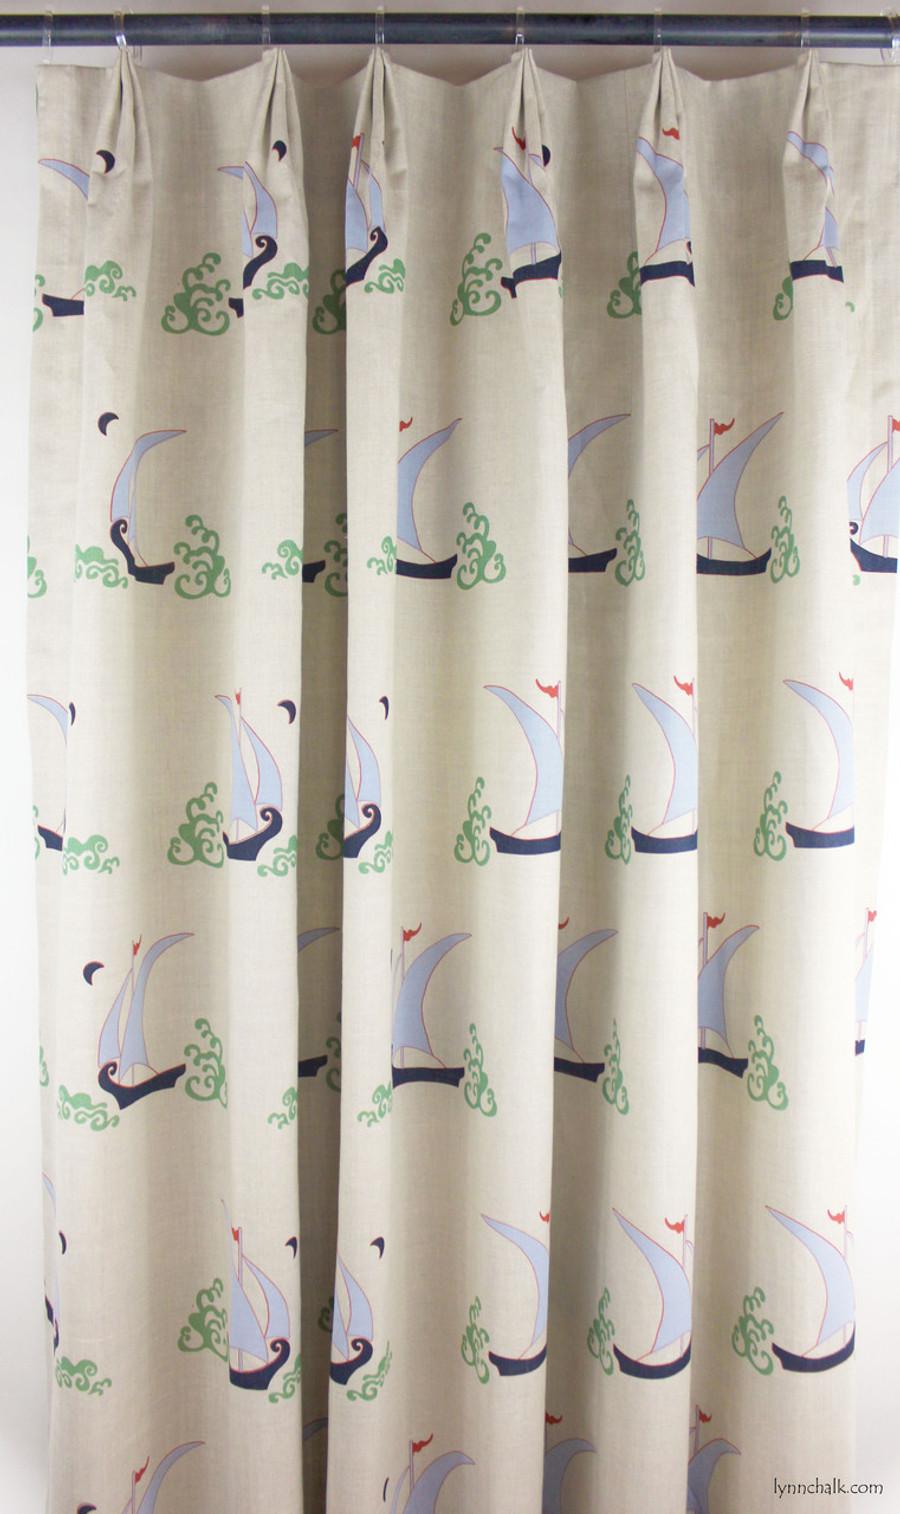 Custom Drapes in Katie Ridder Beetlecat in Lavender on Linen